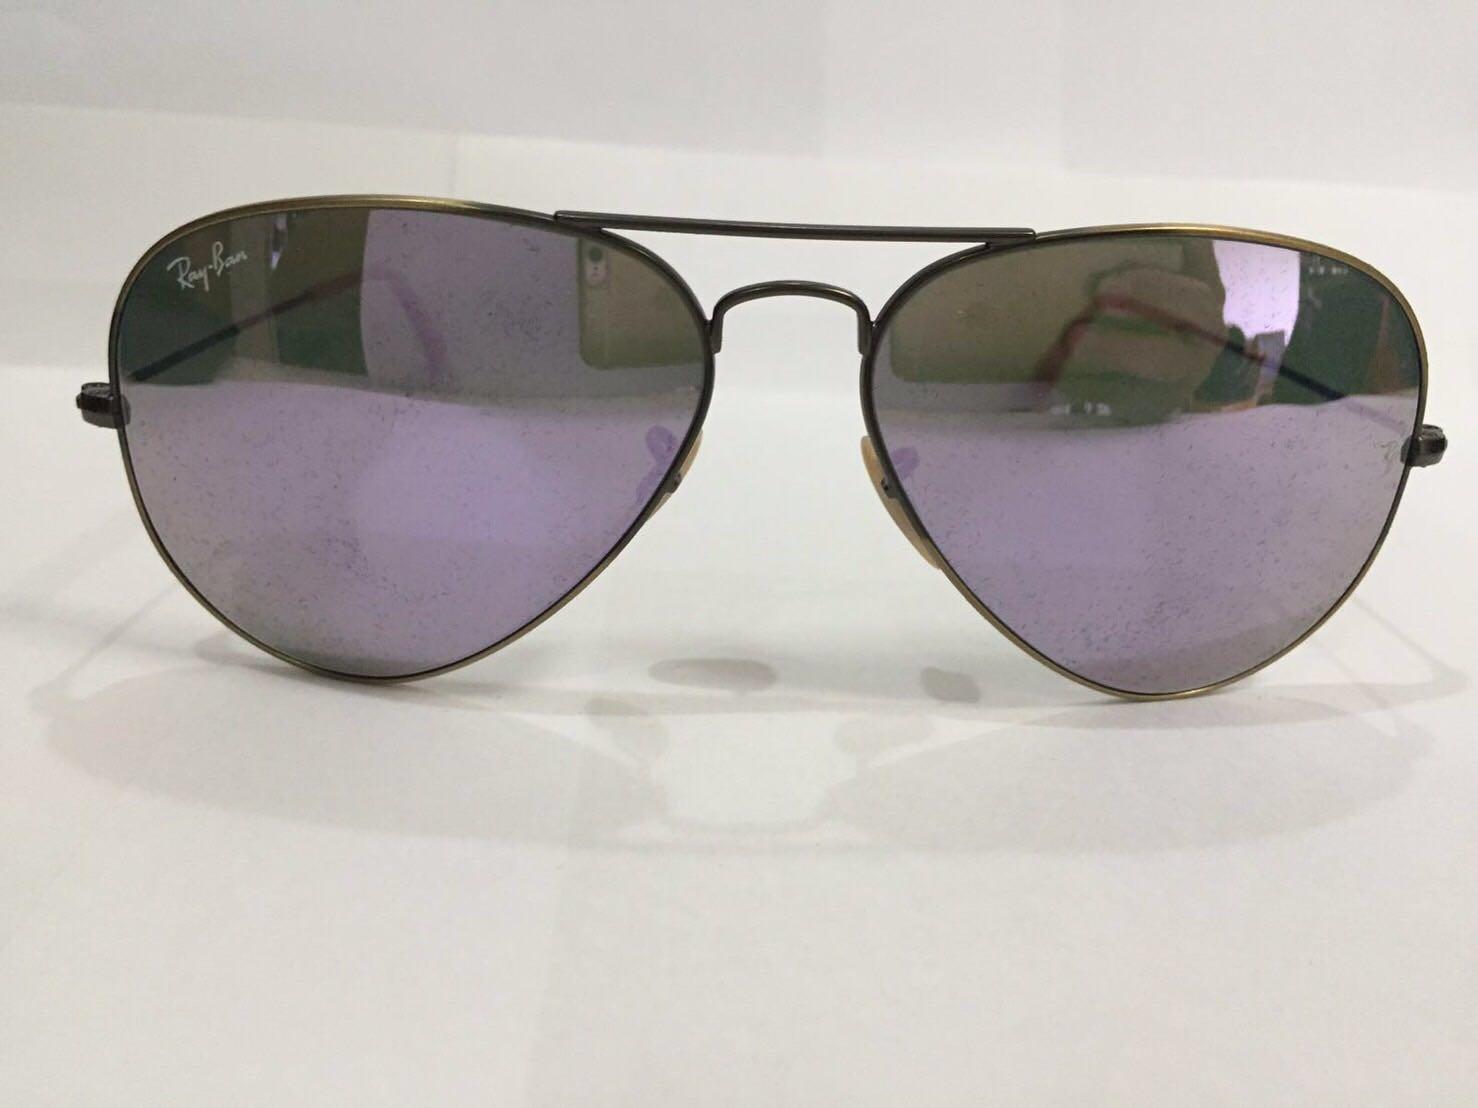 acae373f7e4 Preloved Rayban RB3025 Lilac Flash Lenses